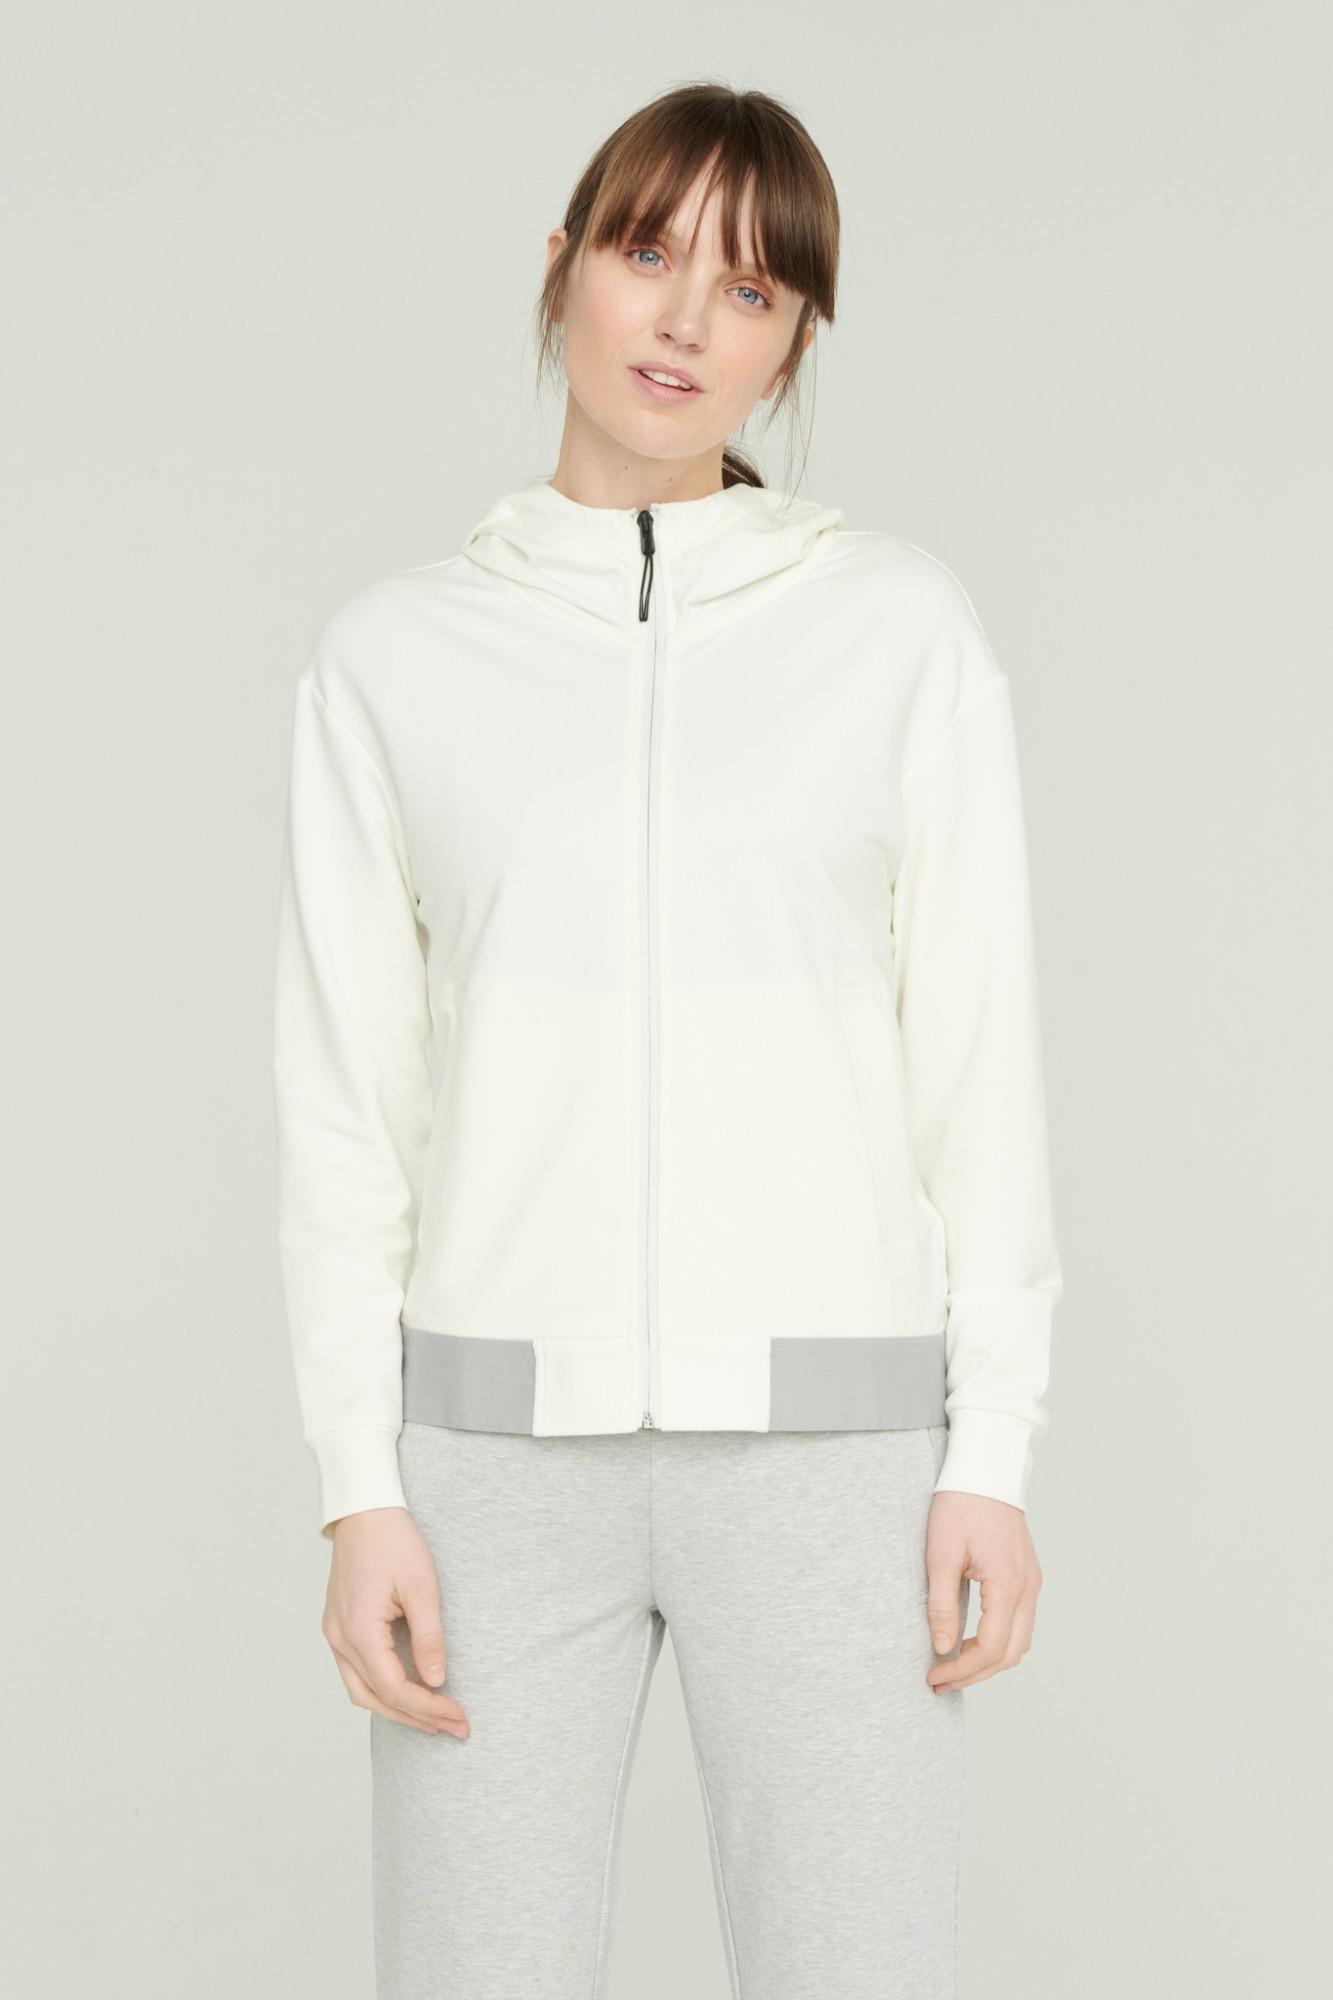 AUDIMAS Atsegamas džemperis su gobtuvu 2111-057 Blanc De Blanc L